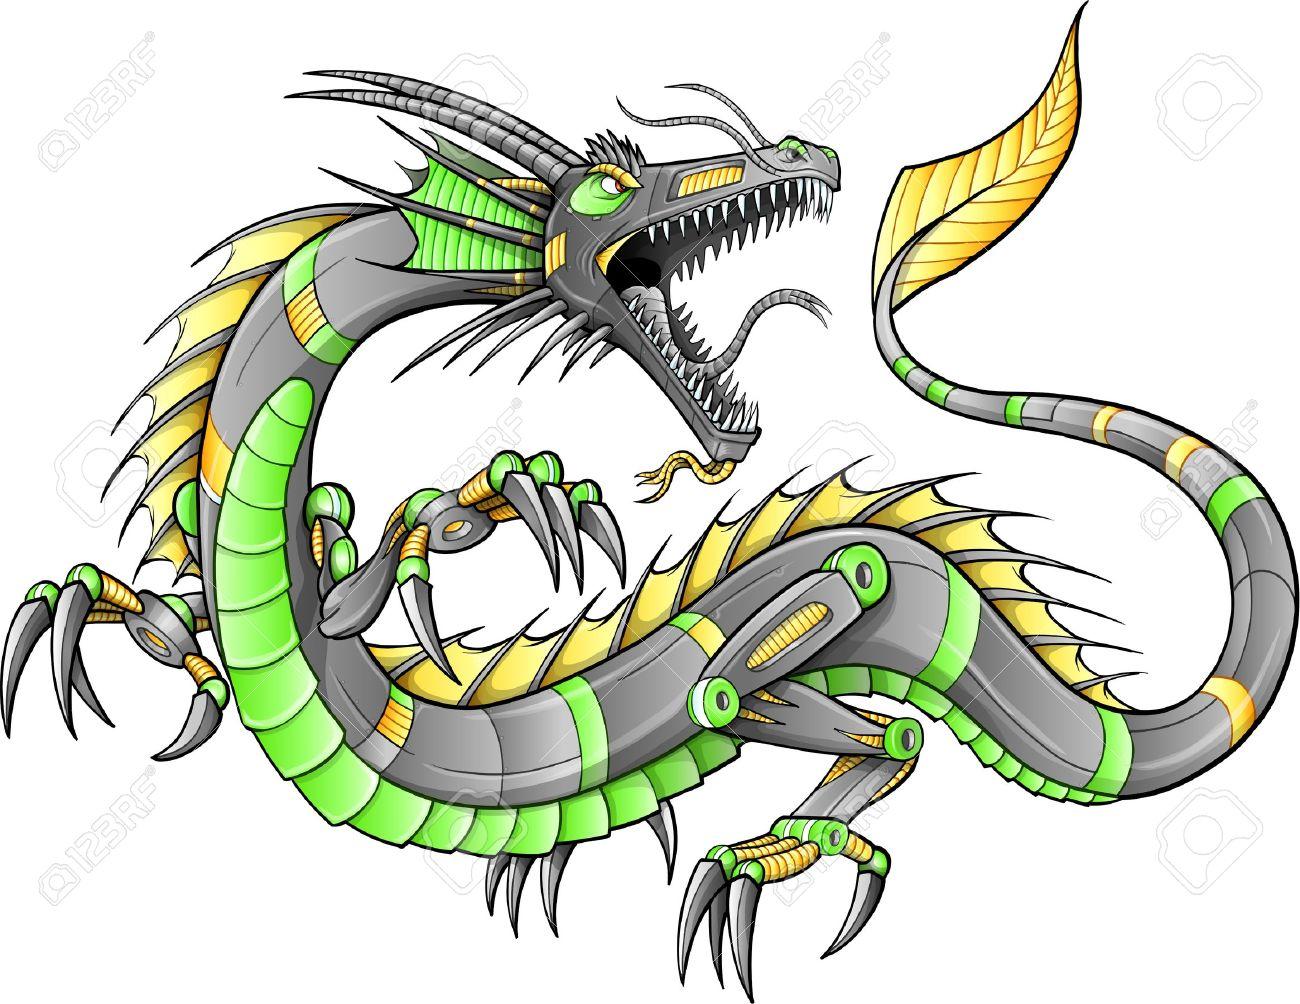 robot cyborg dragon illustration art royalty free cliparts vectors